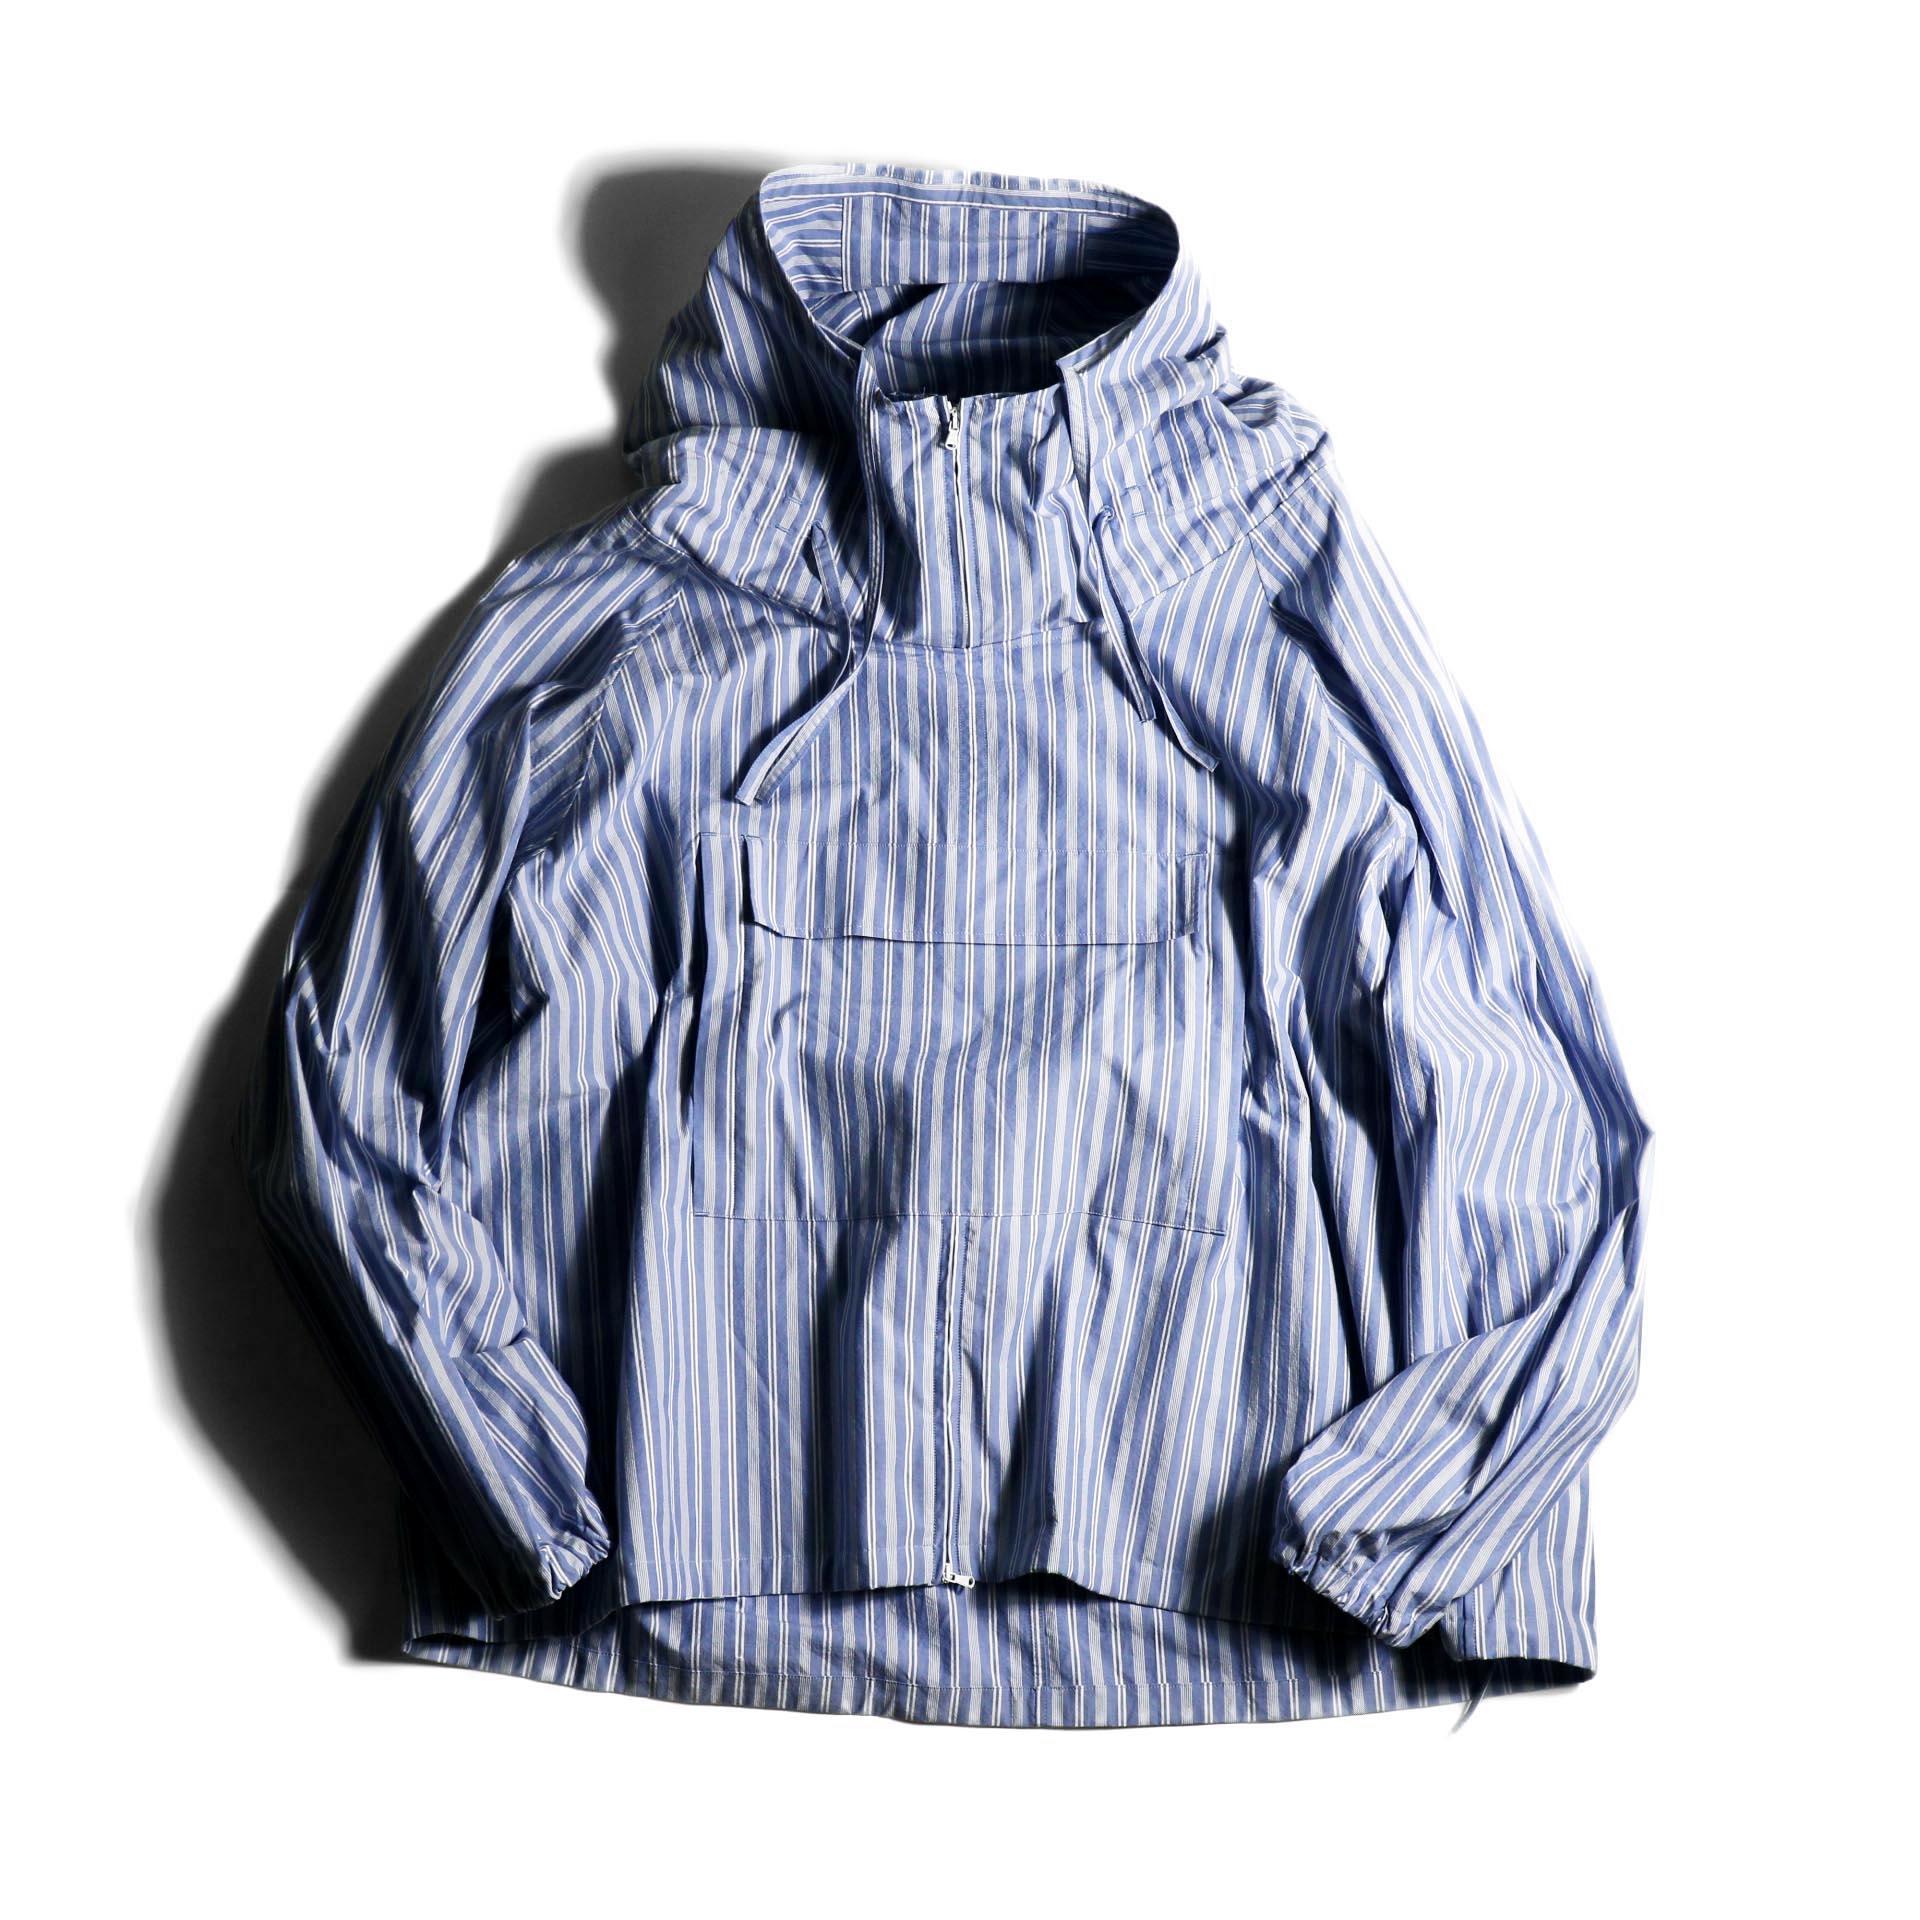 UNUSED / US1793 Shirt Anorak (Sax Stripe) 正面